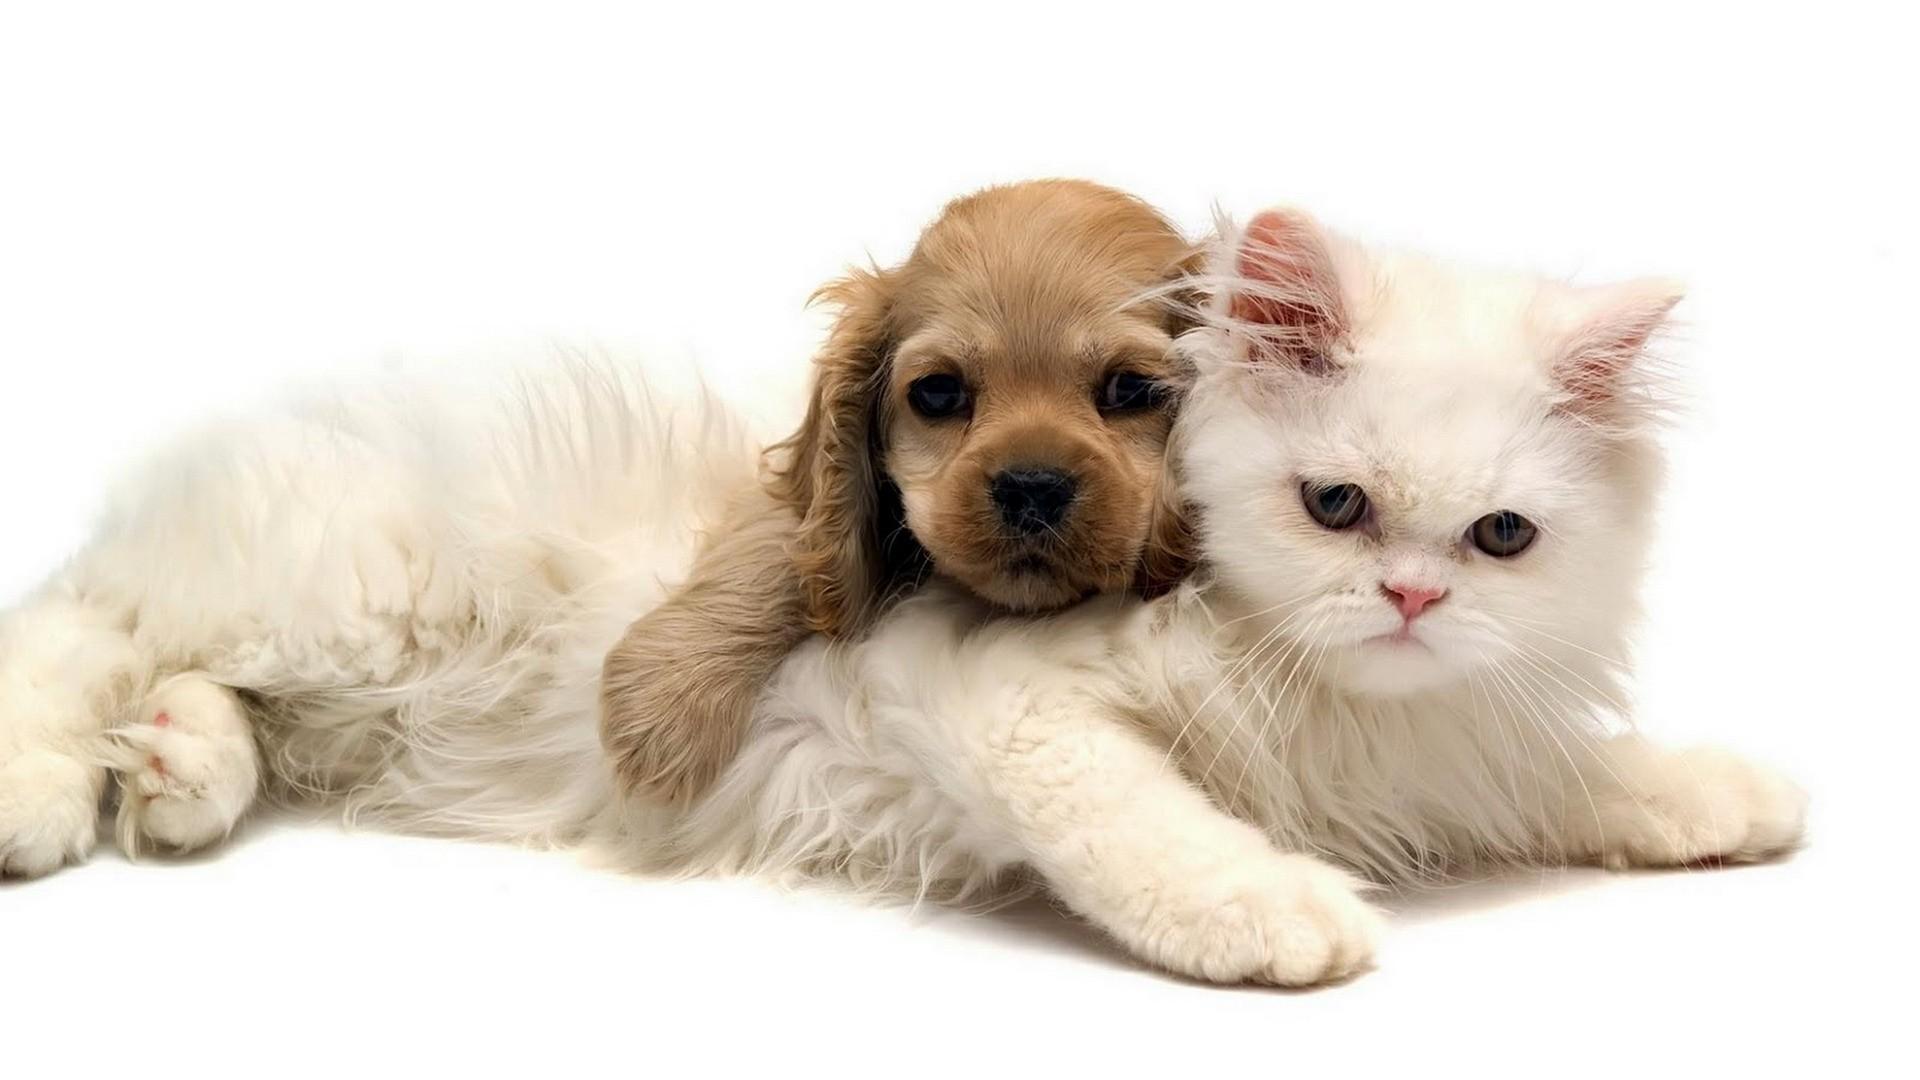 Download Cats Dogs Wallpaper 1920x1080 Wallpoper 260913 1920x1080